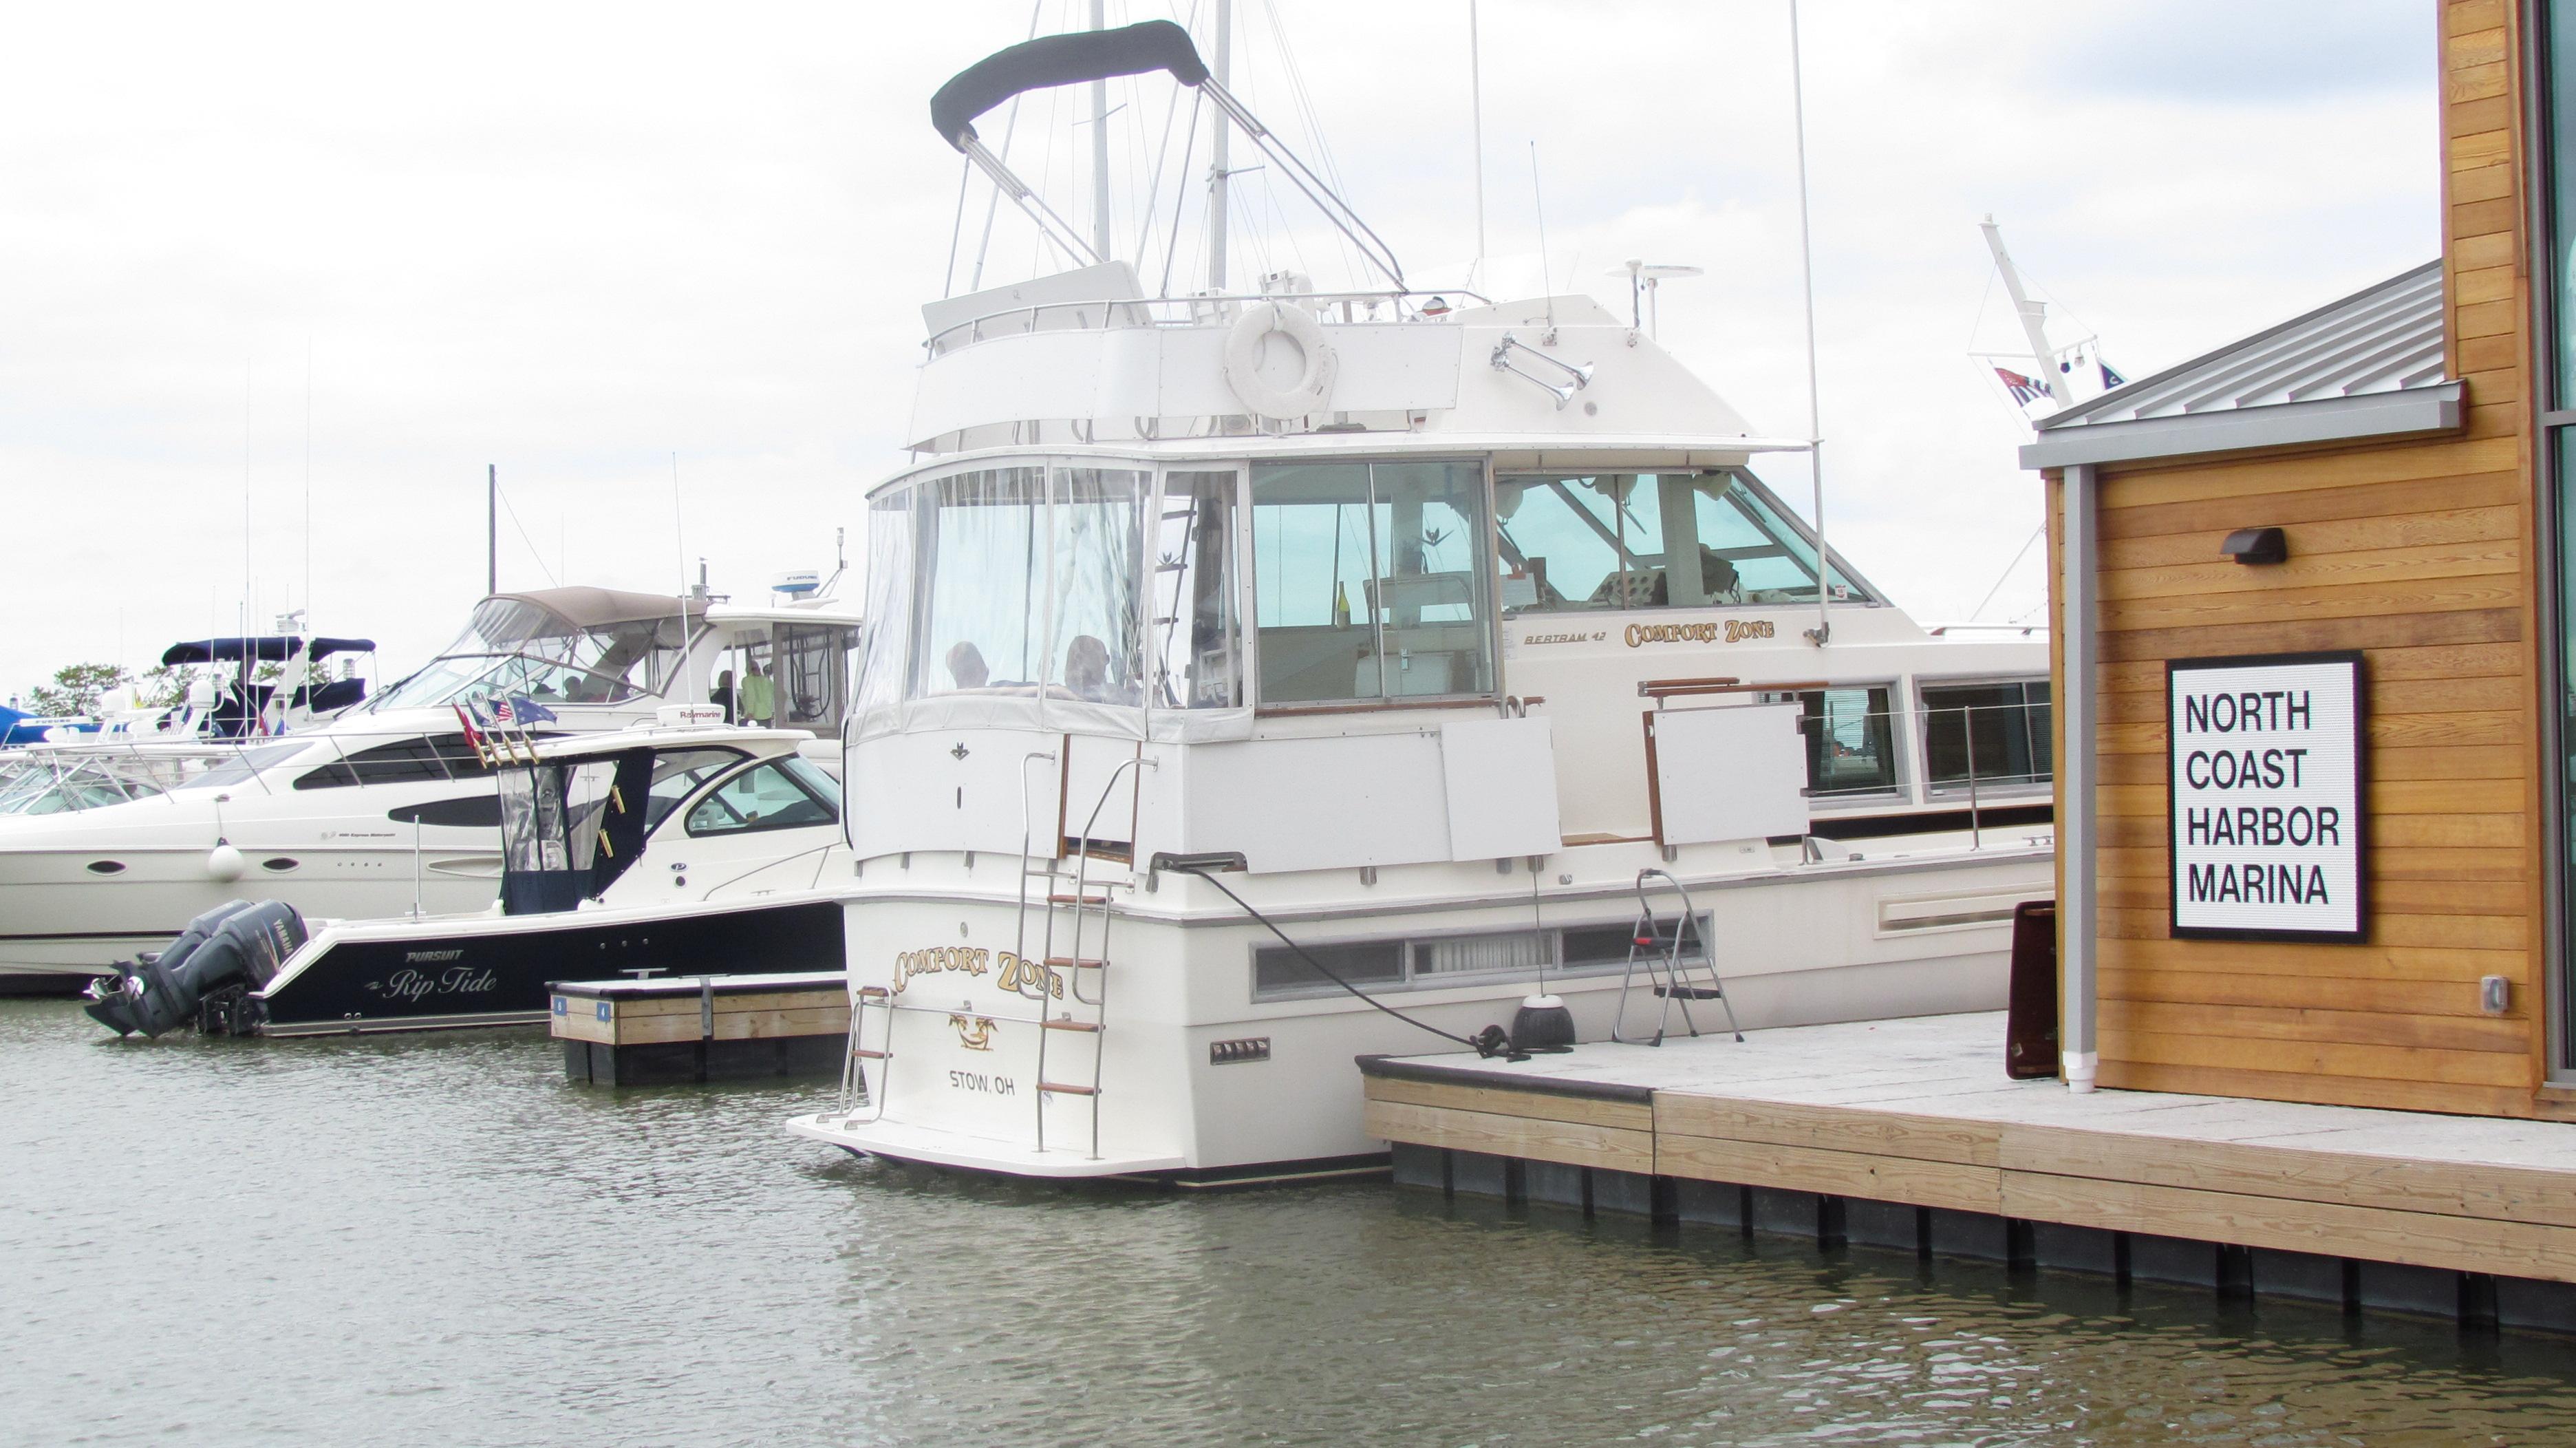 Oasis Marinas at North Coast boats docked   New Marinas Added   Snag-A-Slip